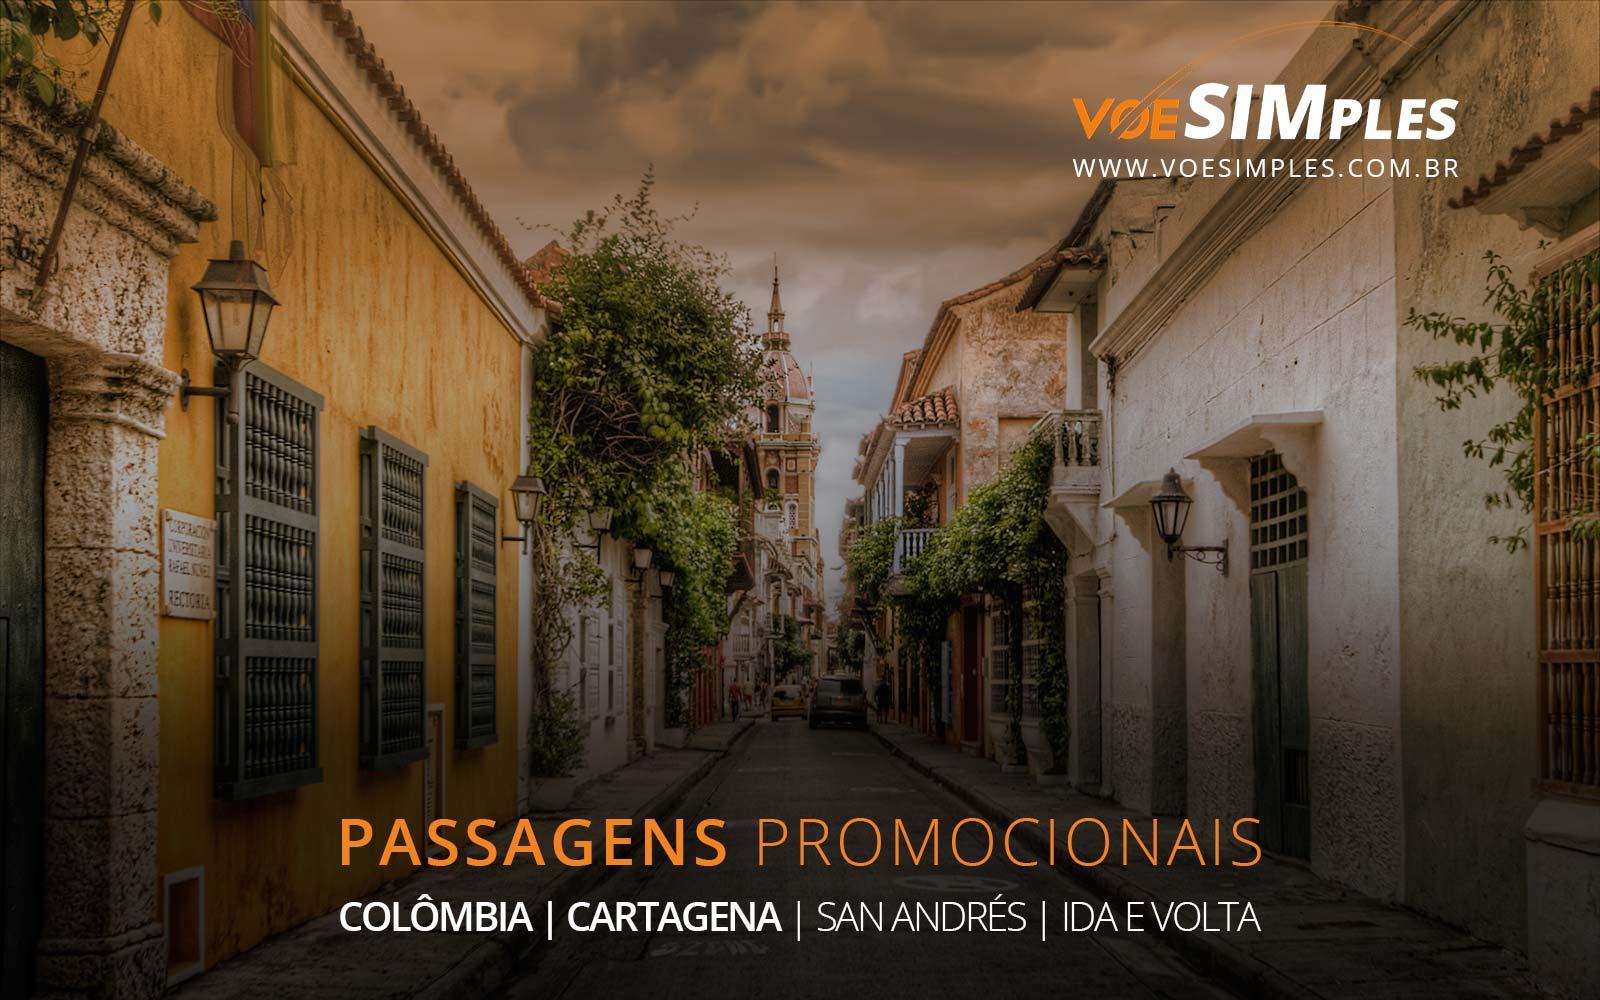 Passagens aéreas promocionais para San Andrés e Cartagena no Caribe Colombiano